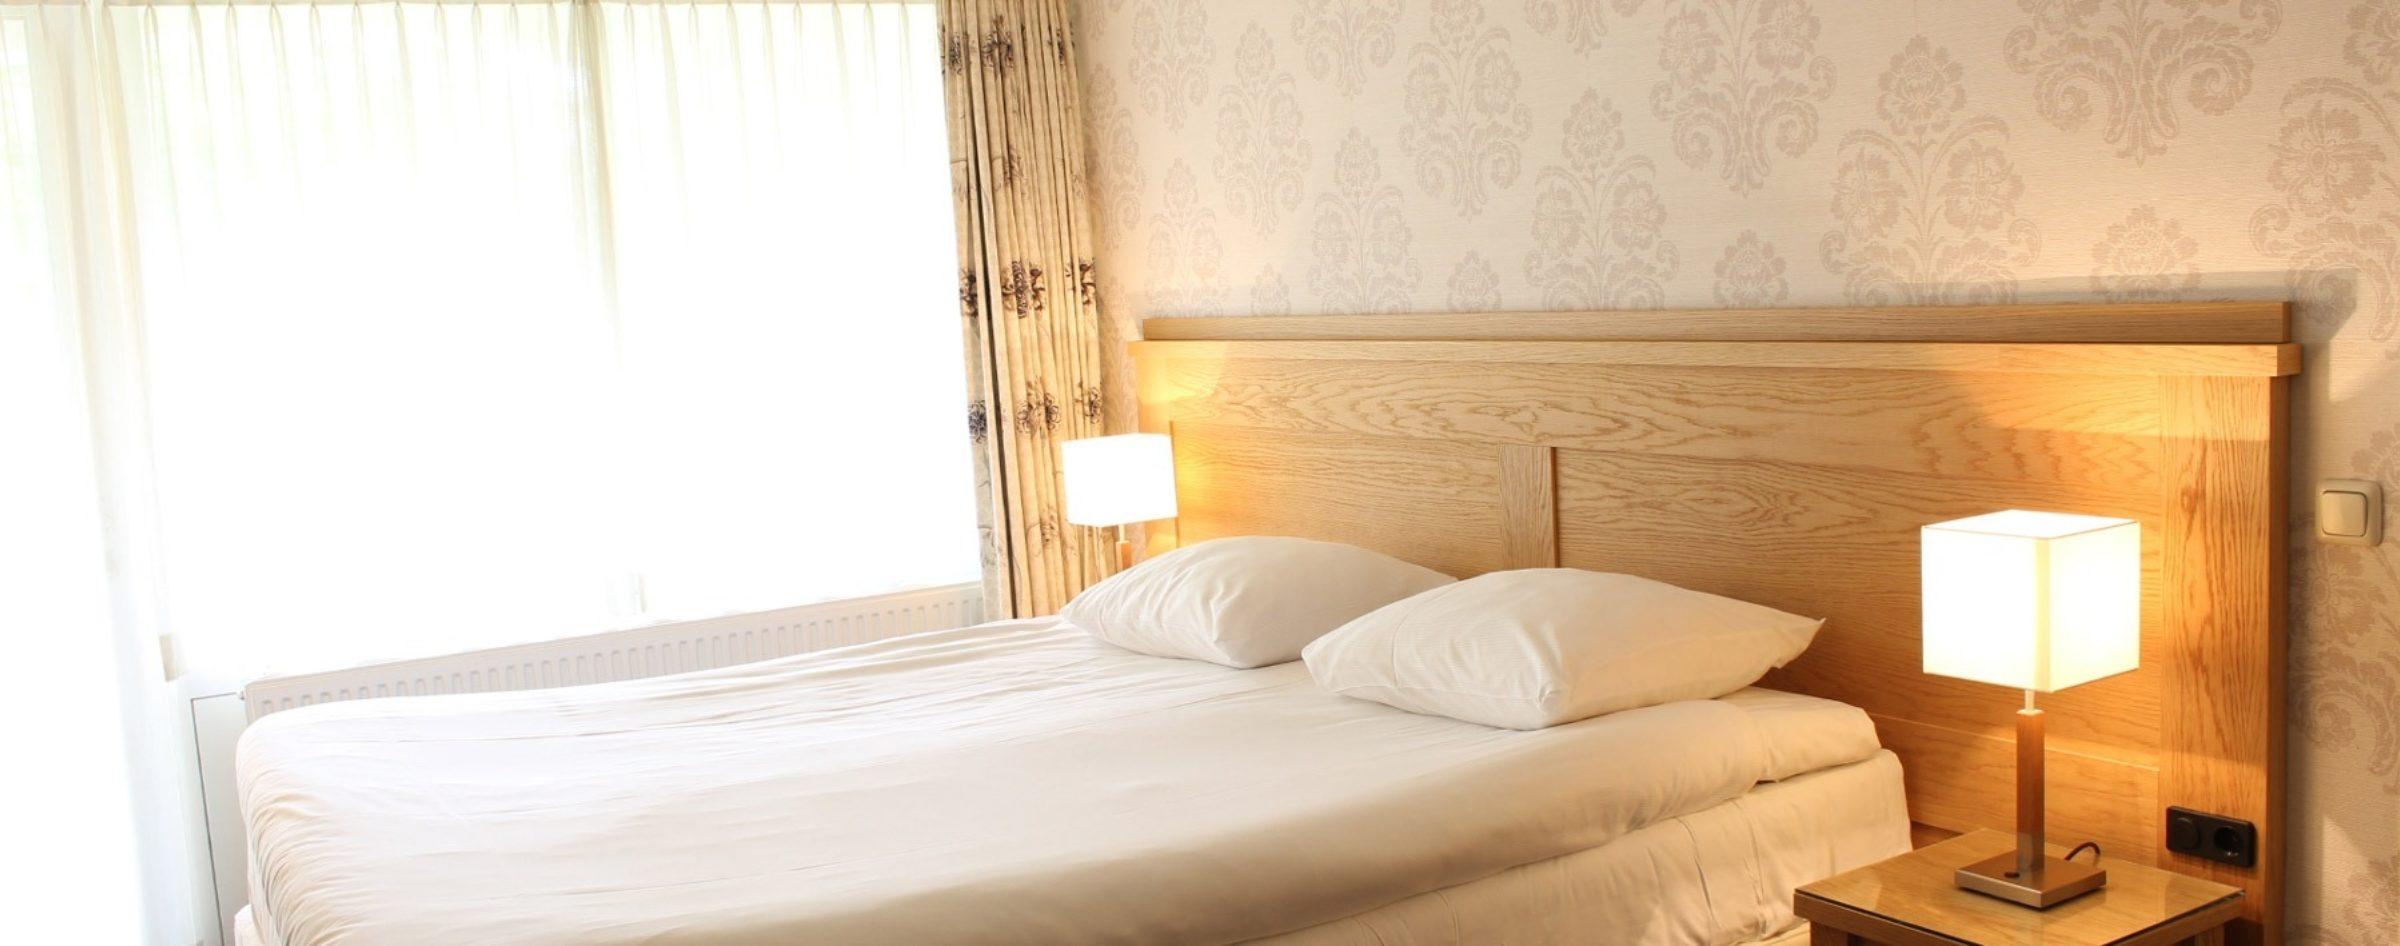 Resort  Bad  Boekelo28429